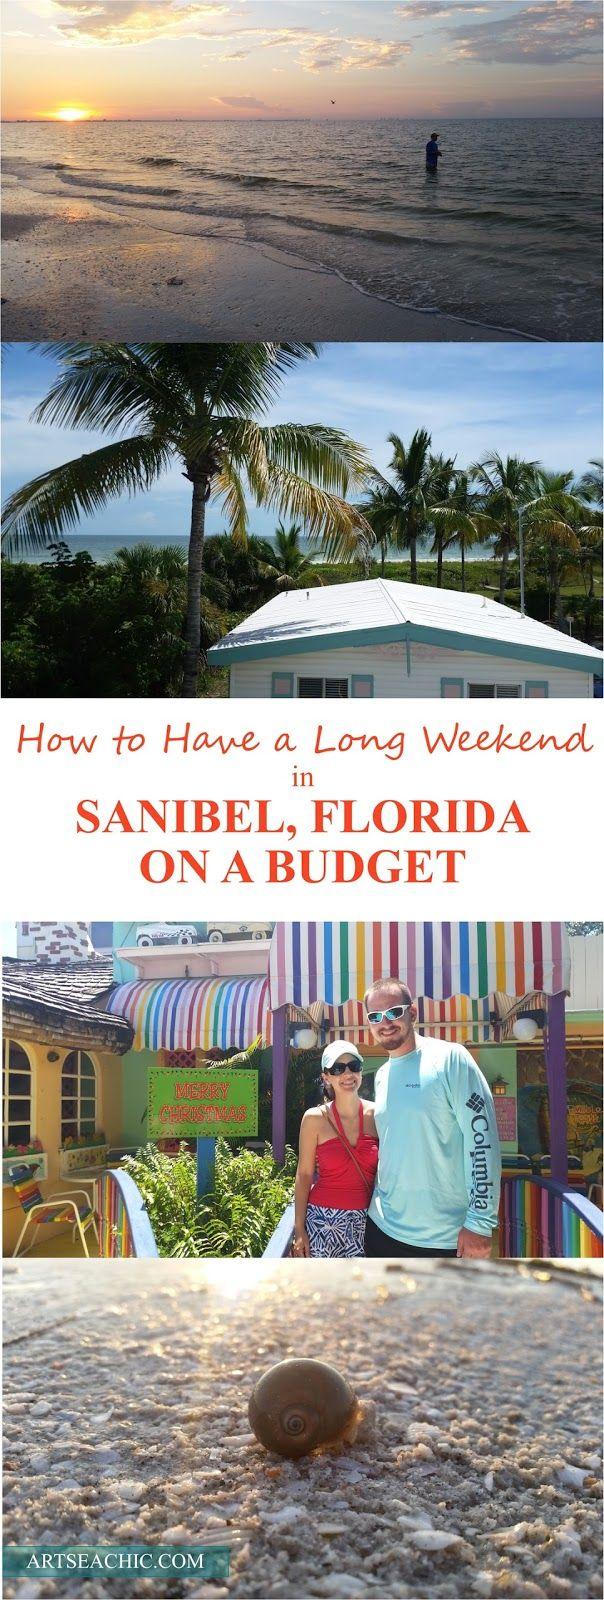 Best 20 long weekend ideas on pinterest weekend humor for Long weekend trip ideas